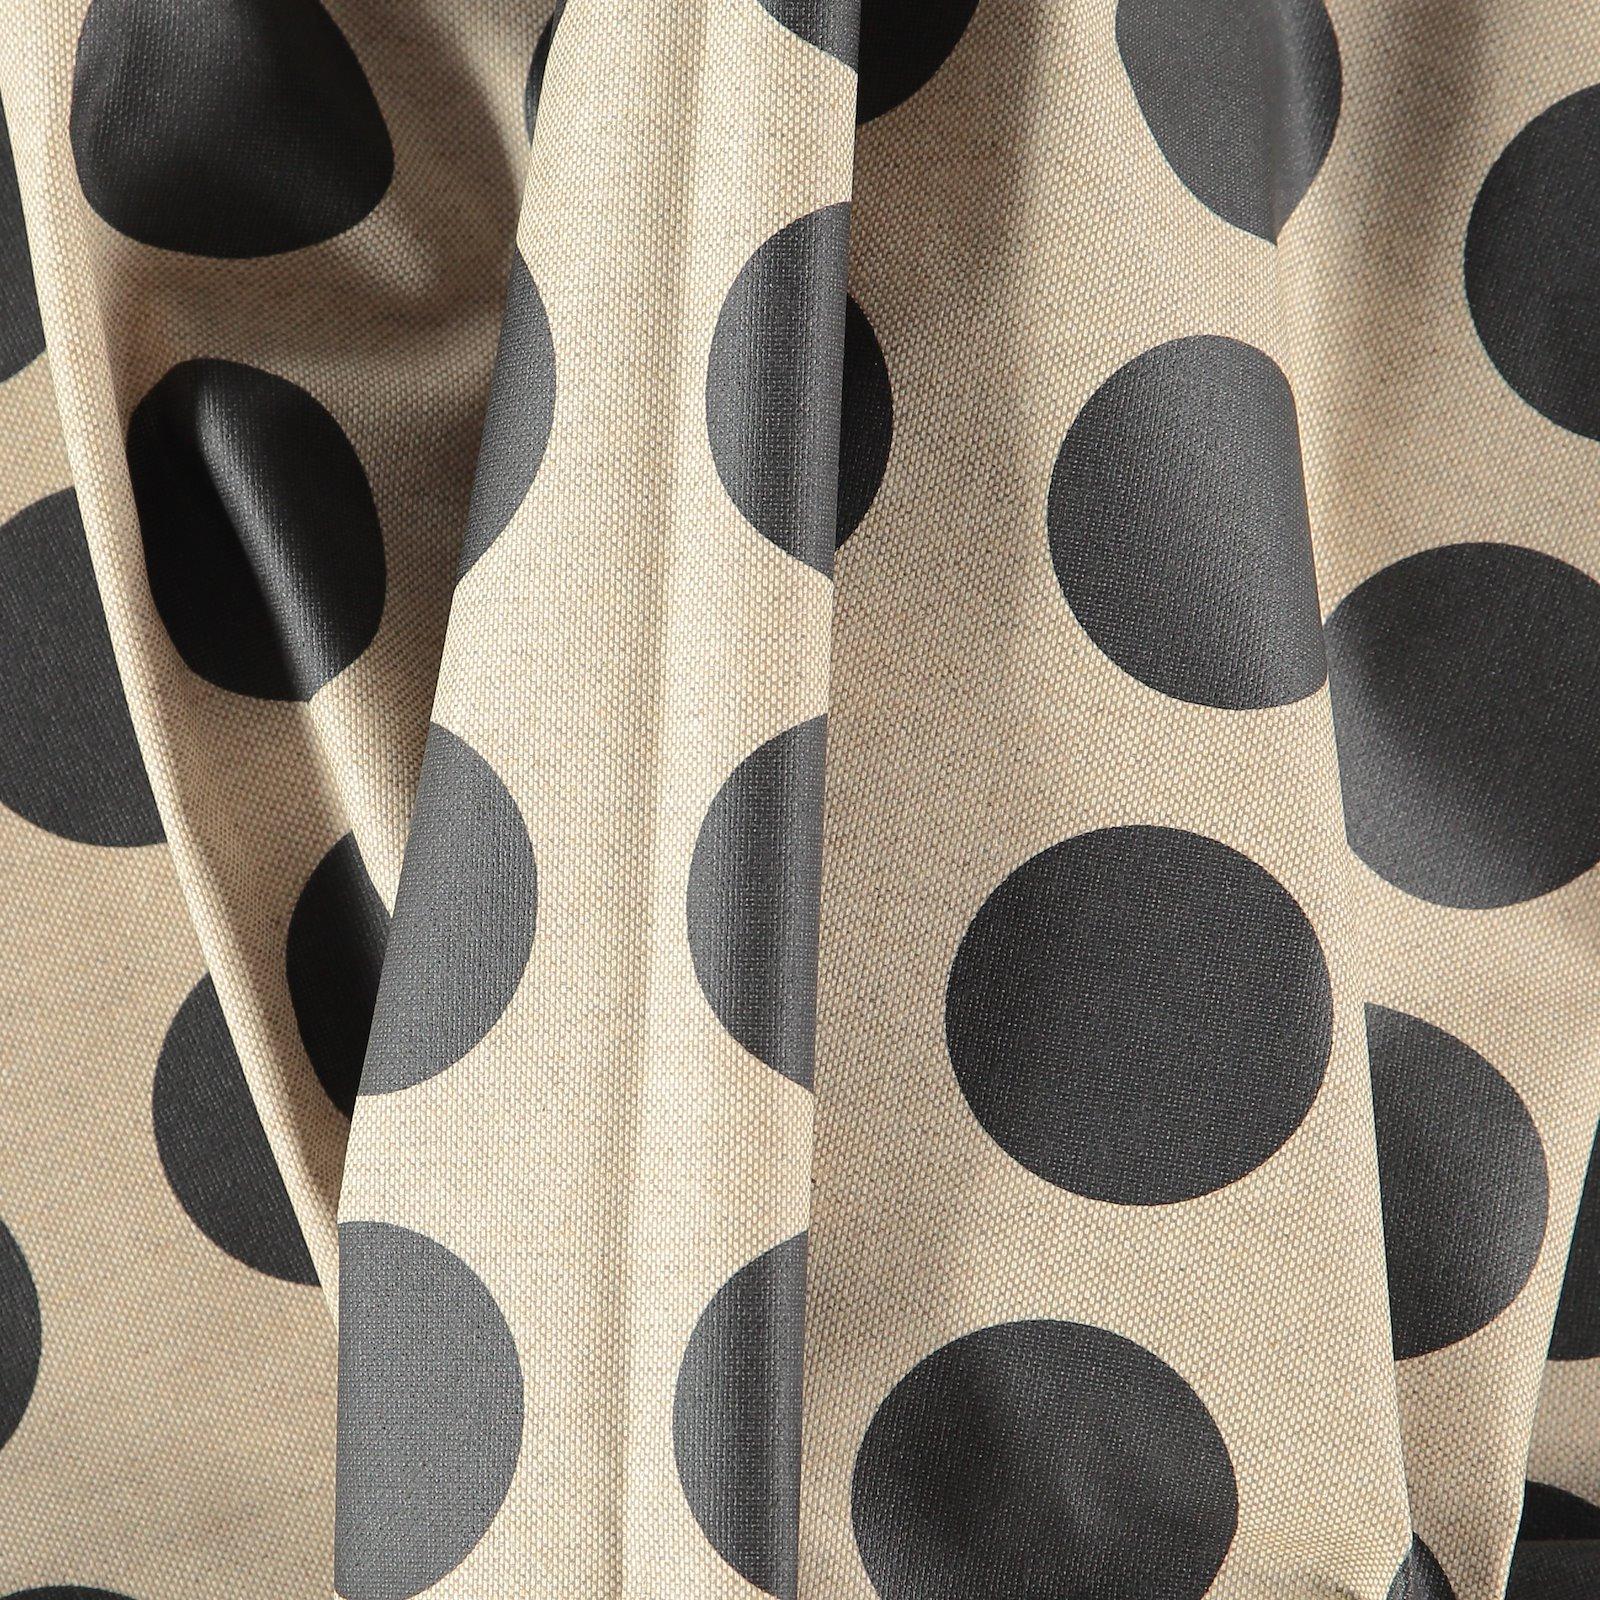 Woven oilcloth linenlook w black dots